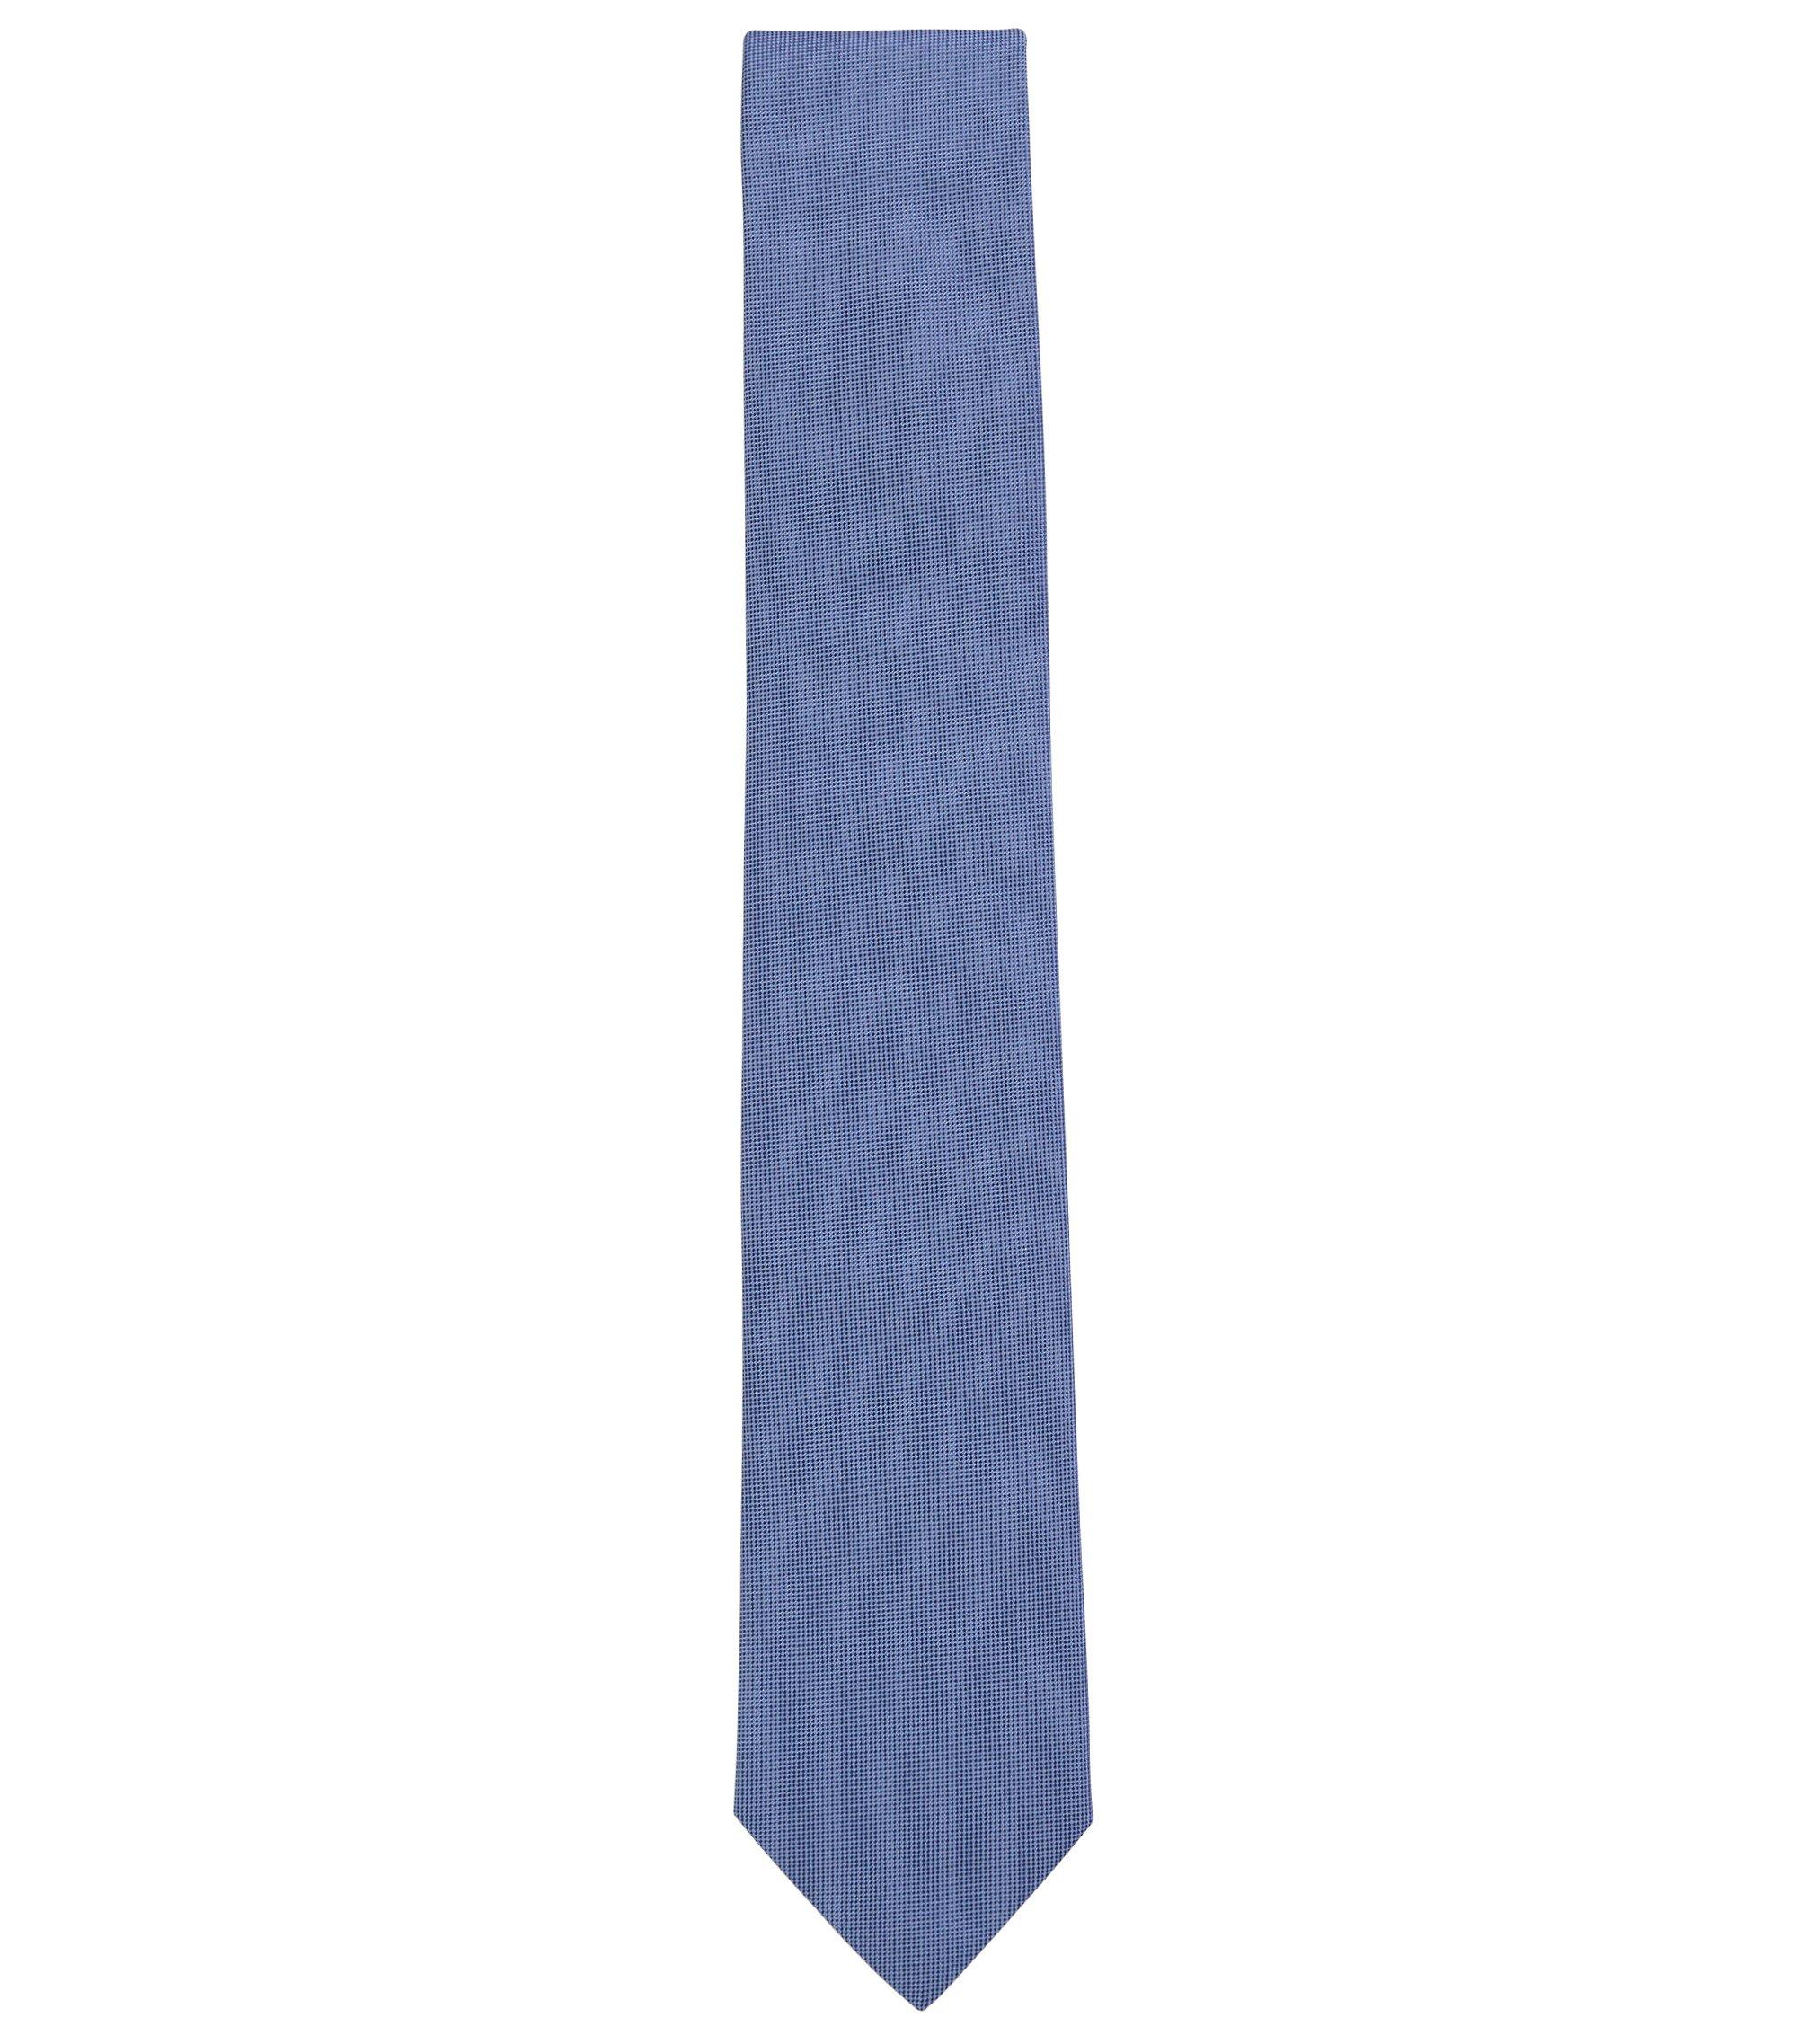 Woven pure silk tie, Hellblau